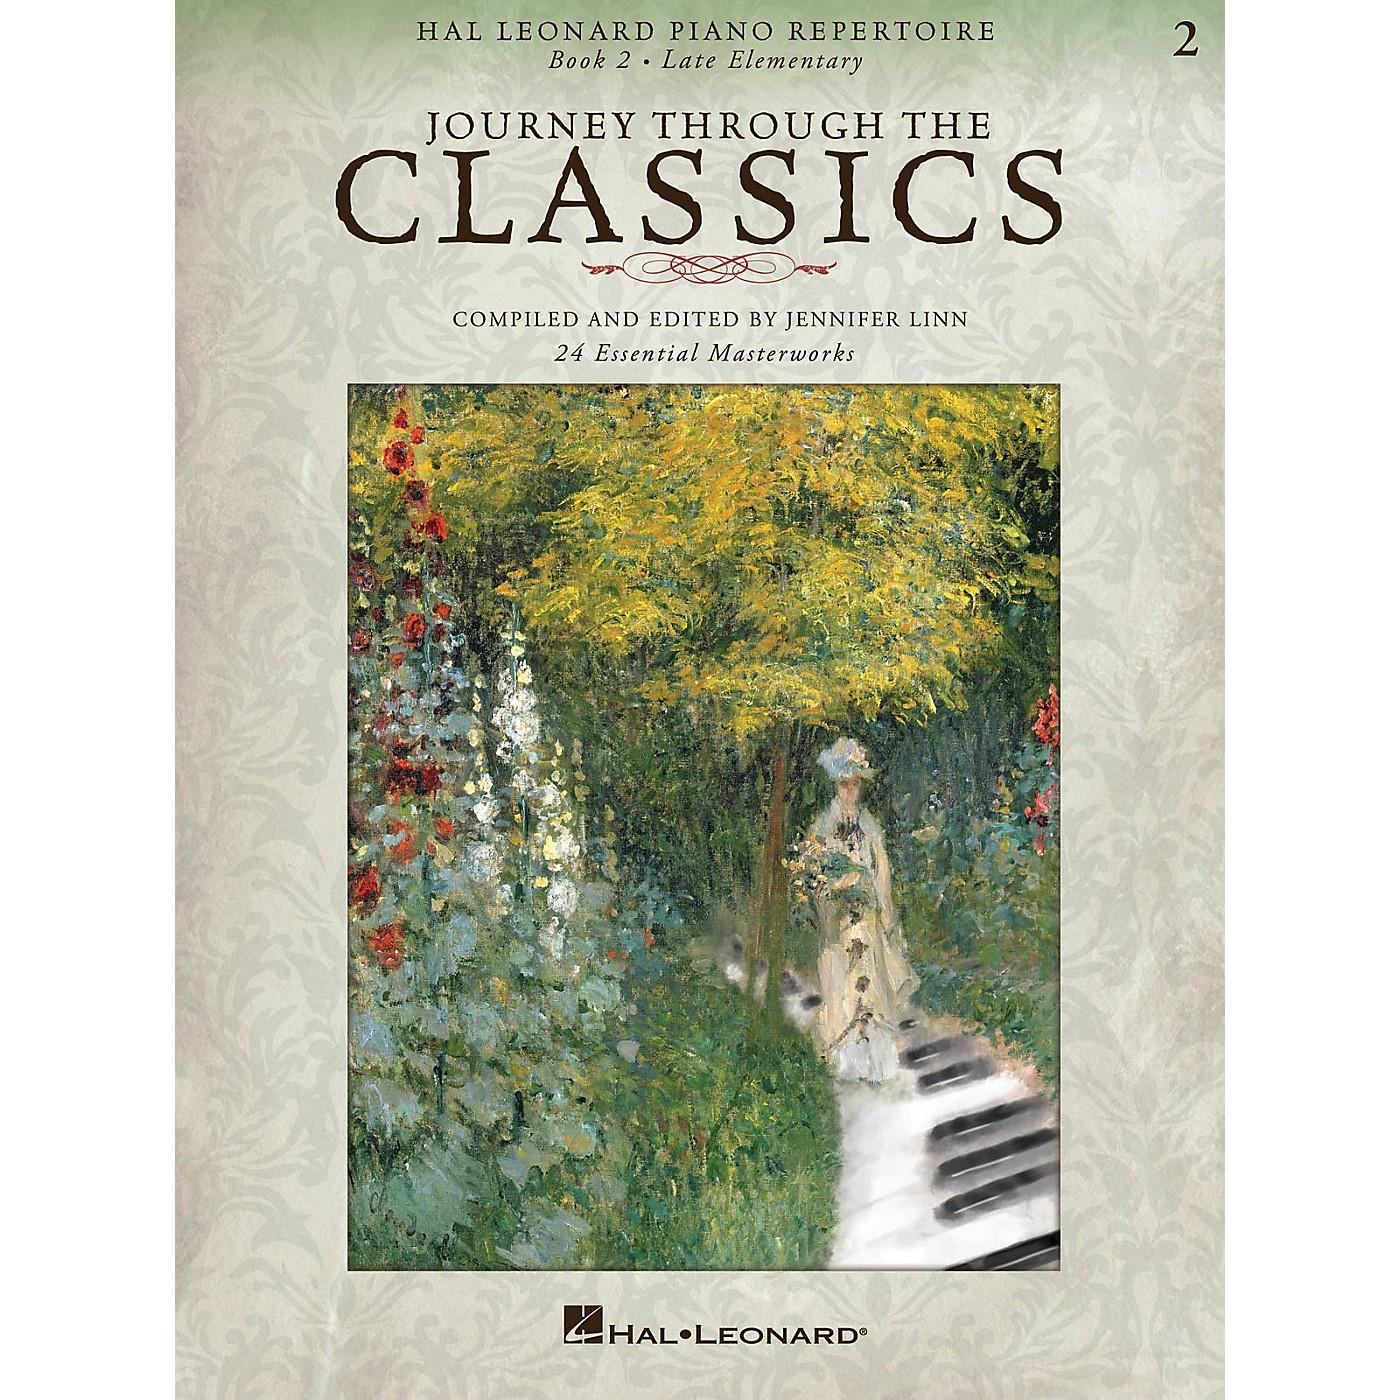 Hal Leonard Piano Repertoire Series - Journey Through The Classics Book 2 Late Elementary thumbnail